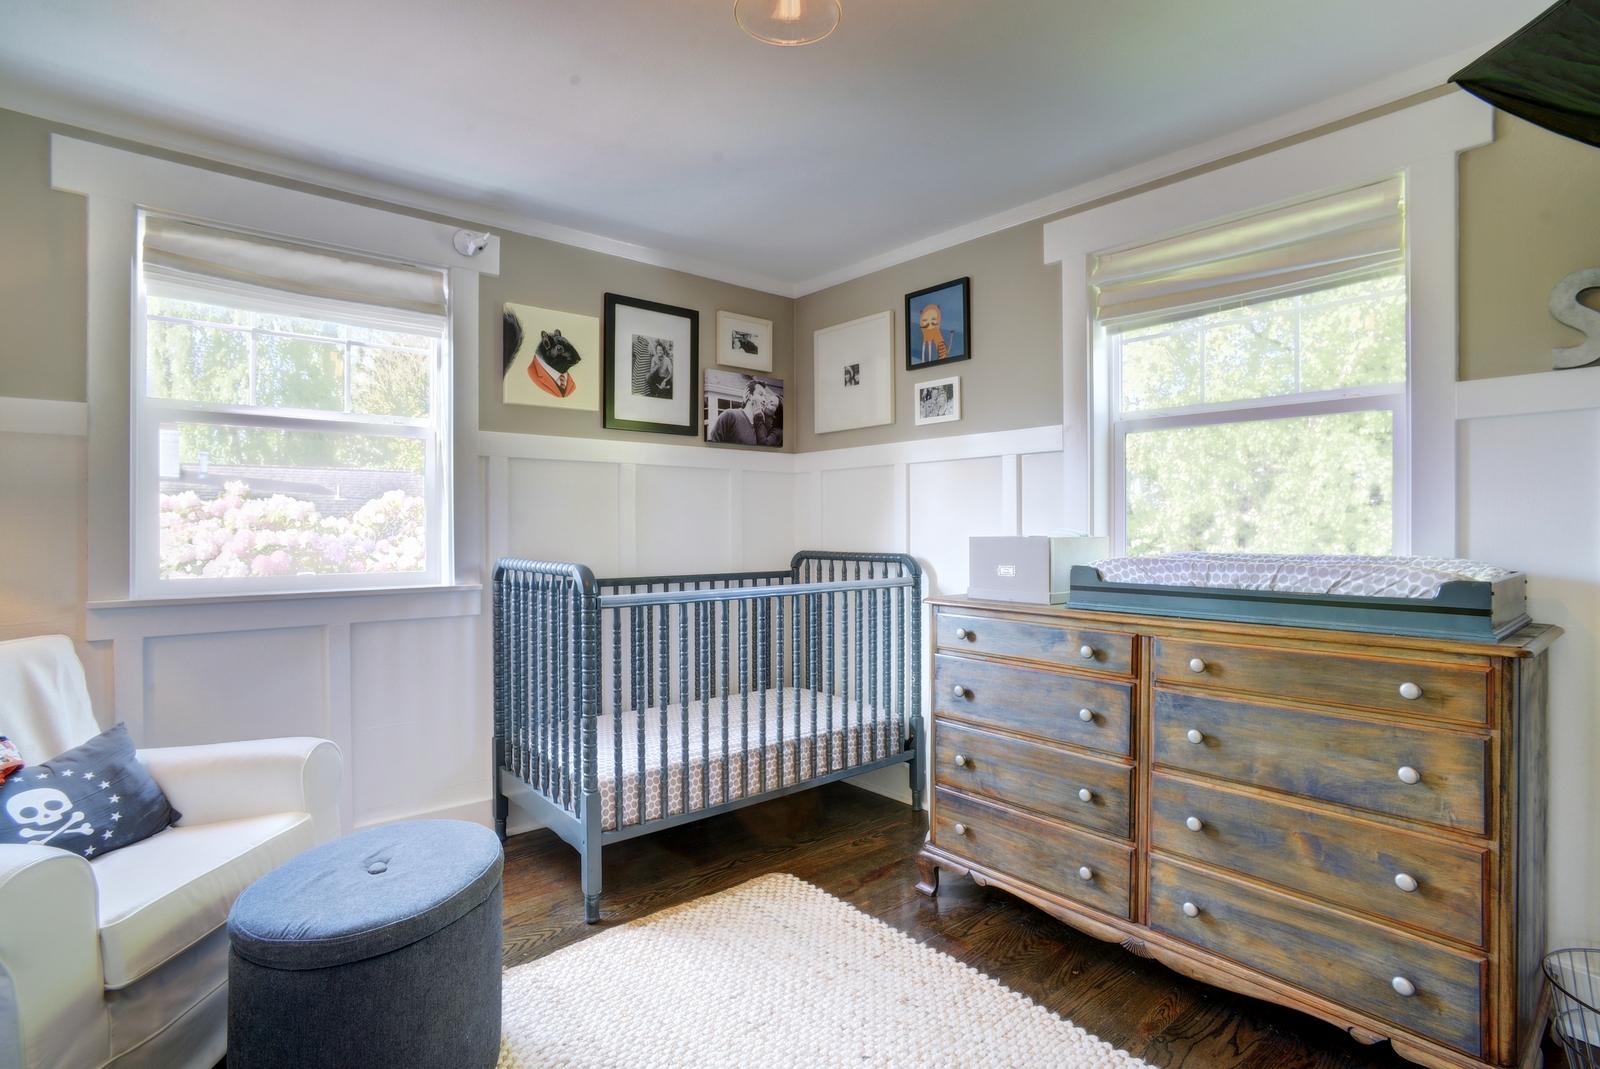 21-child's room.jpg